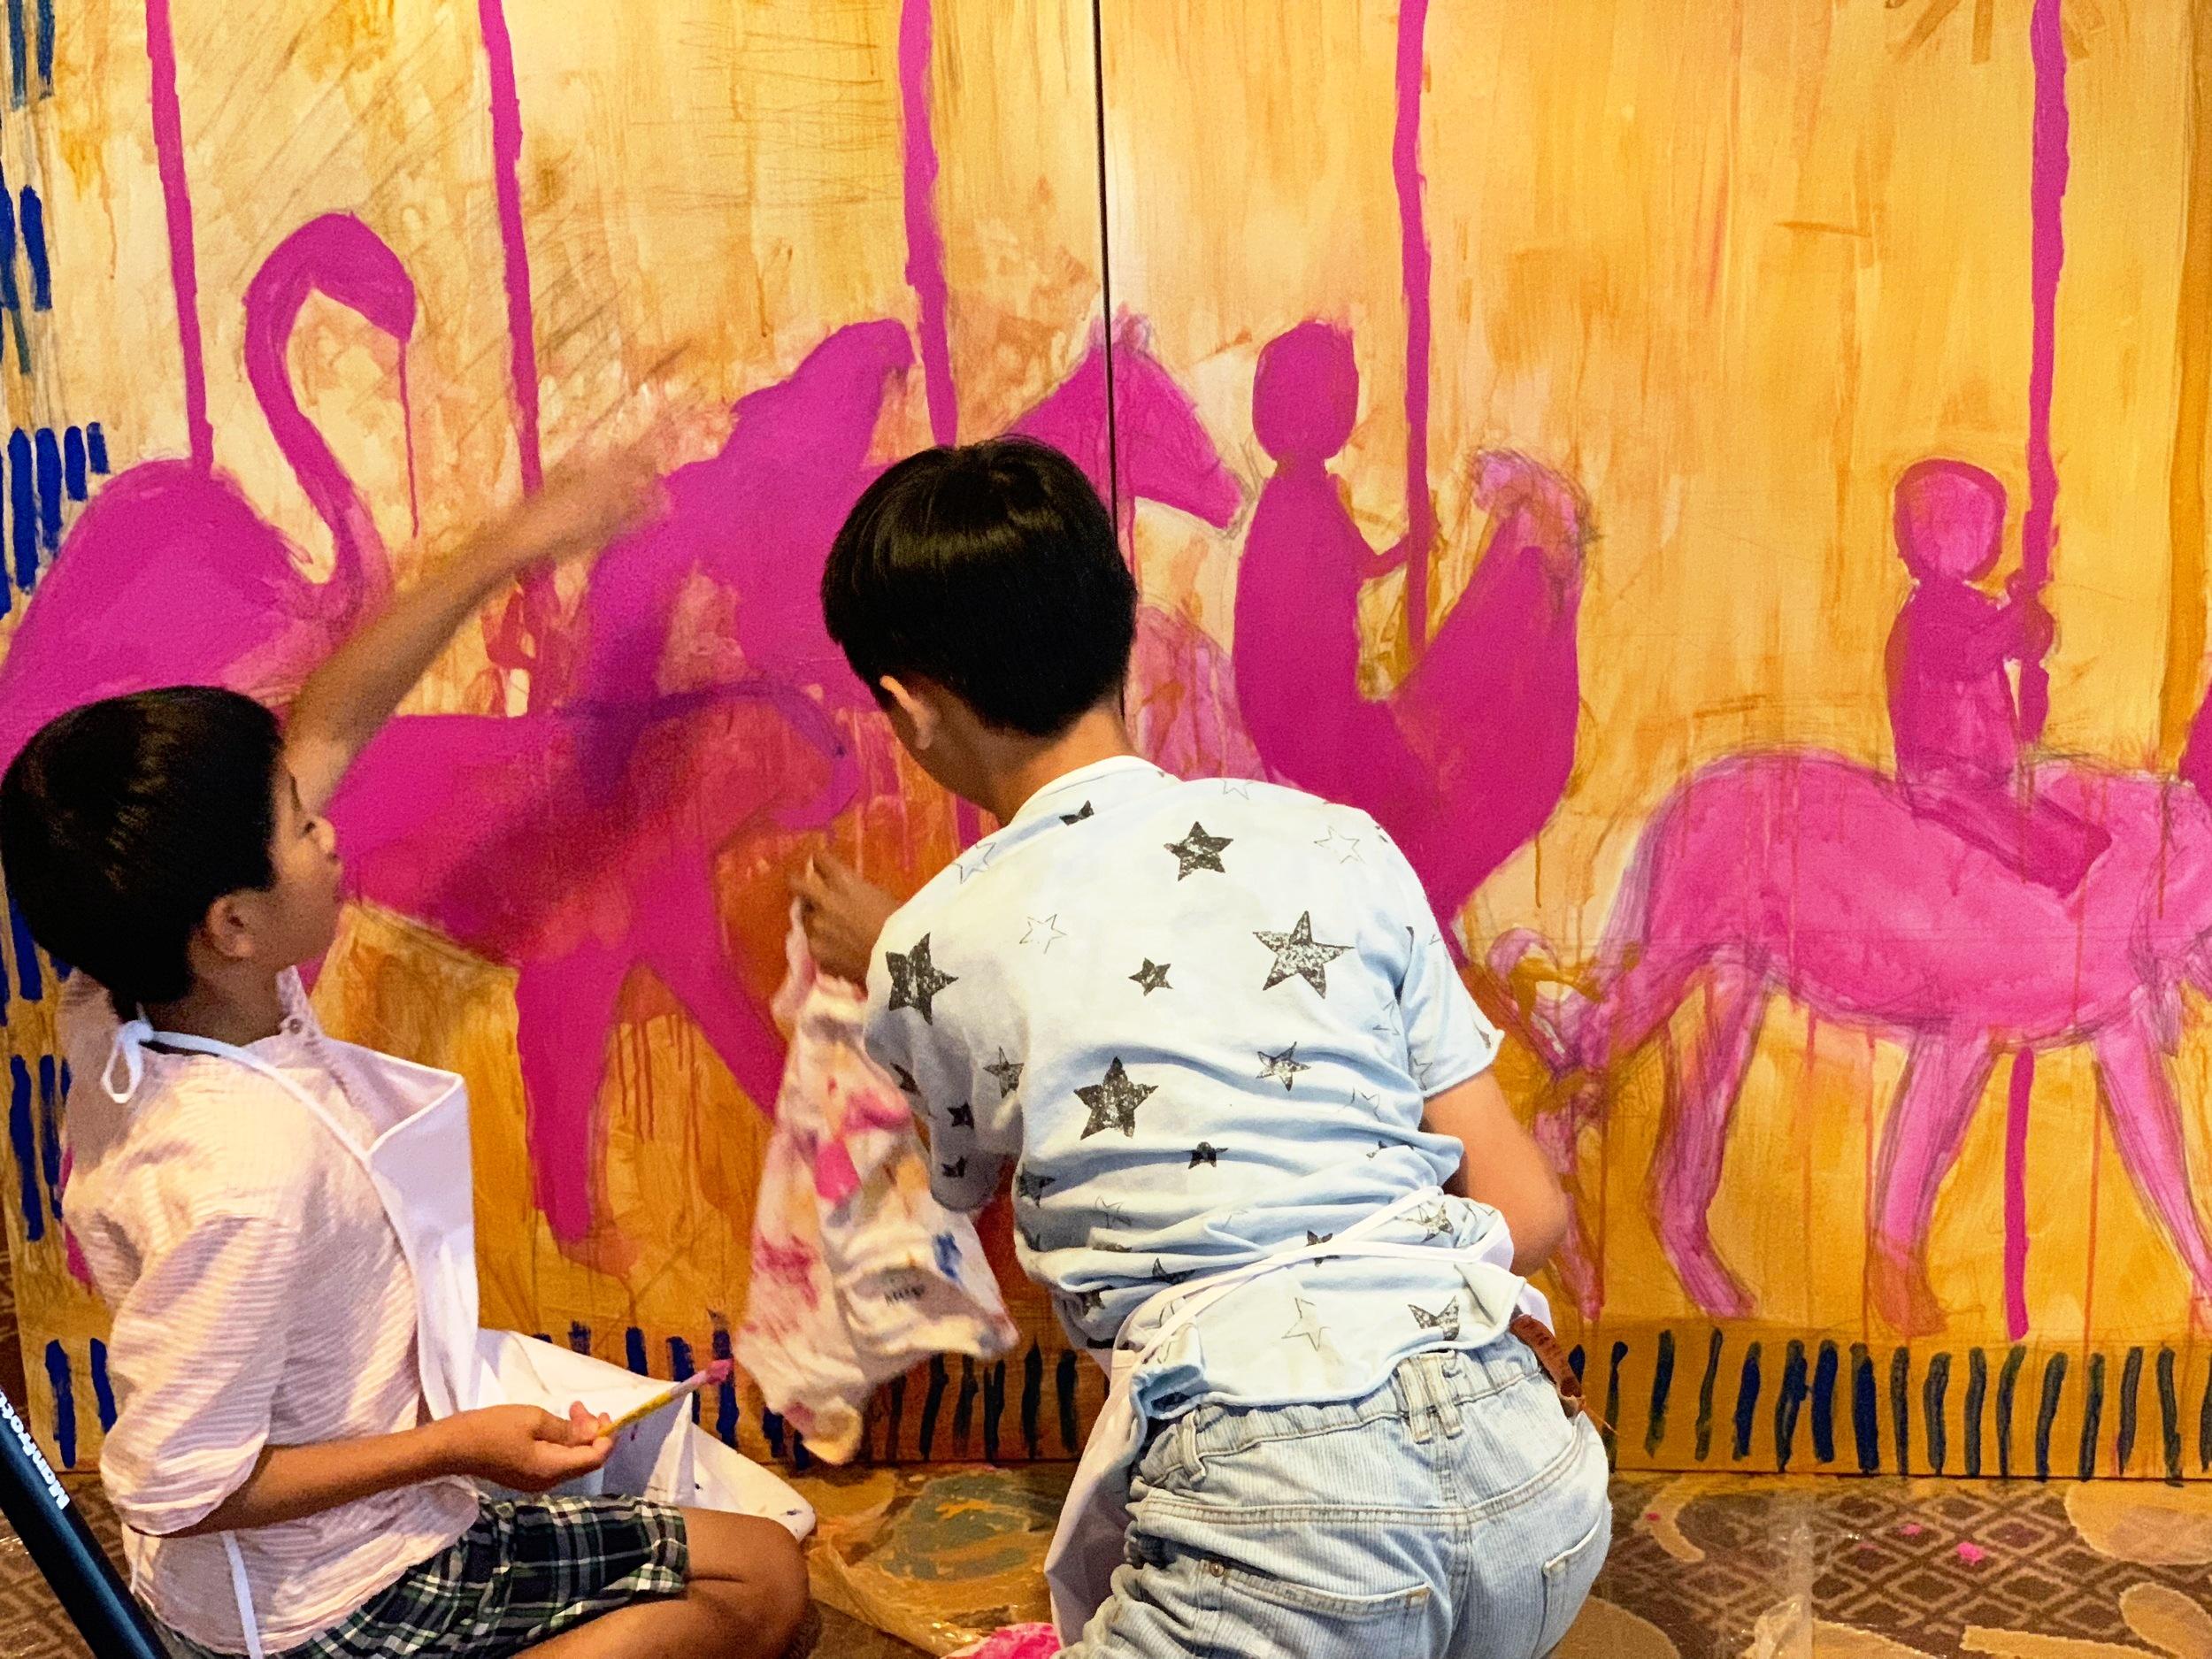 Swirl-Mural-ArtistAtPlay-FourSeasons-DC.jpg